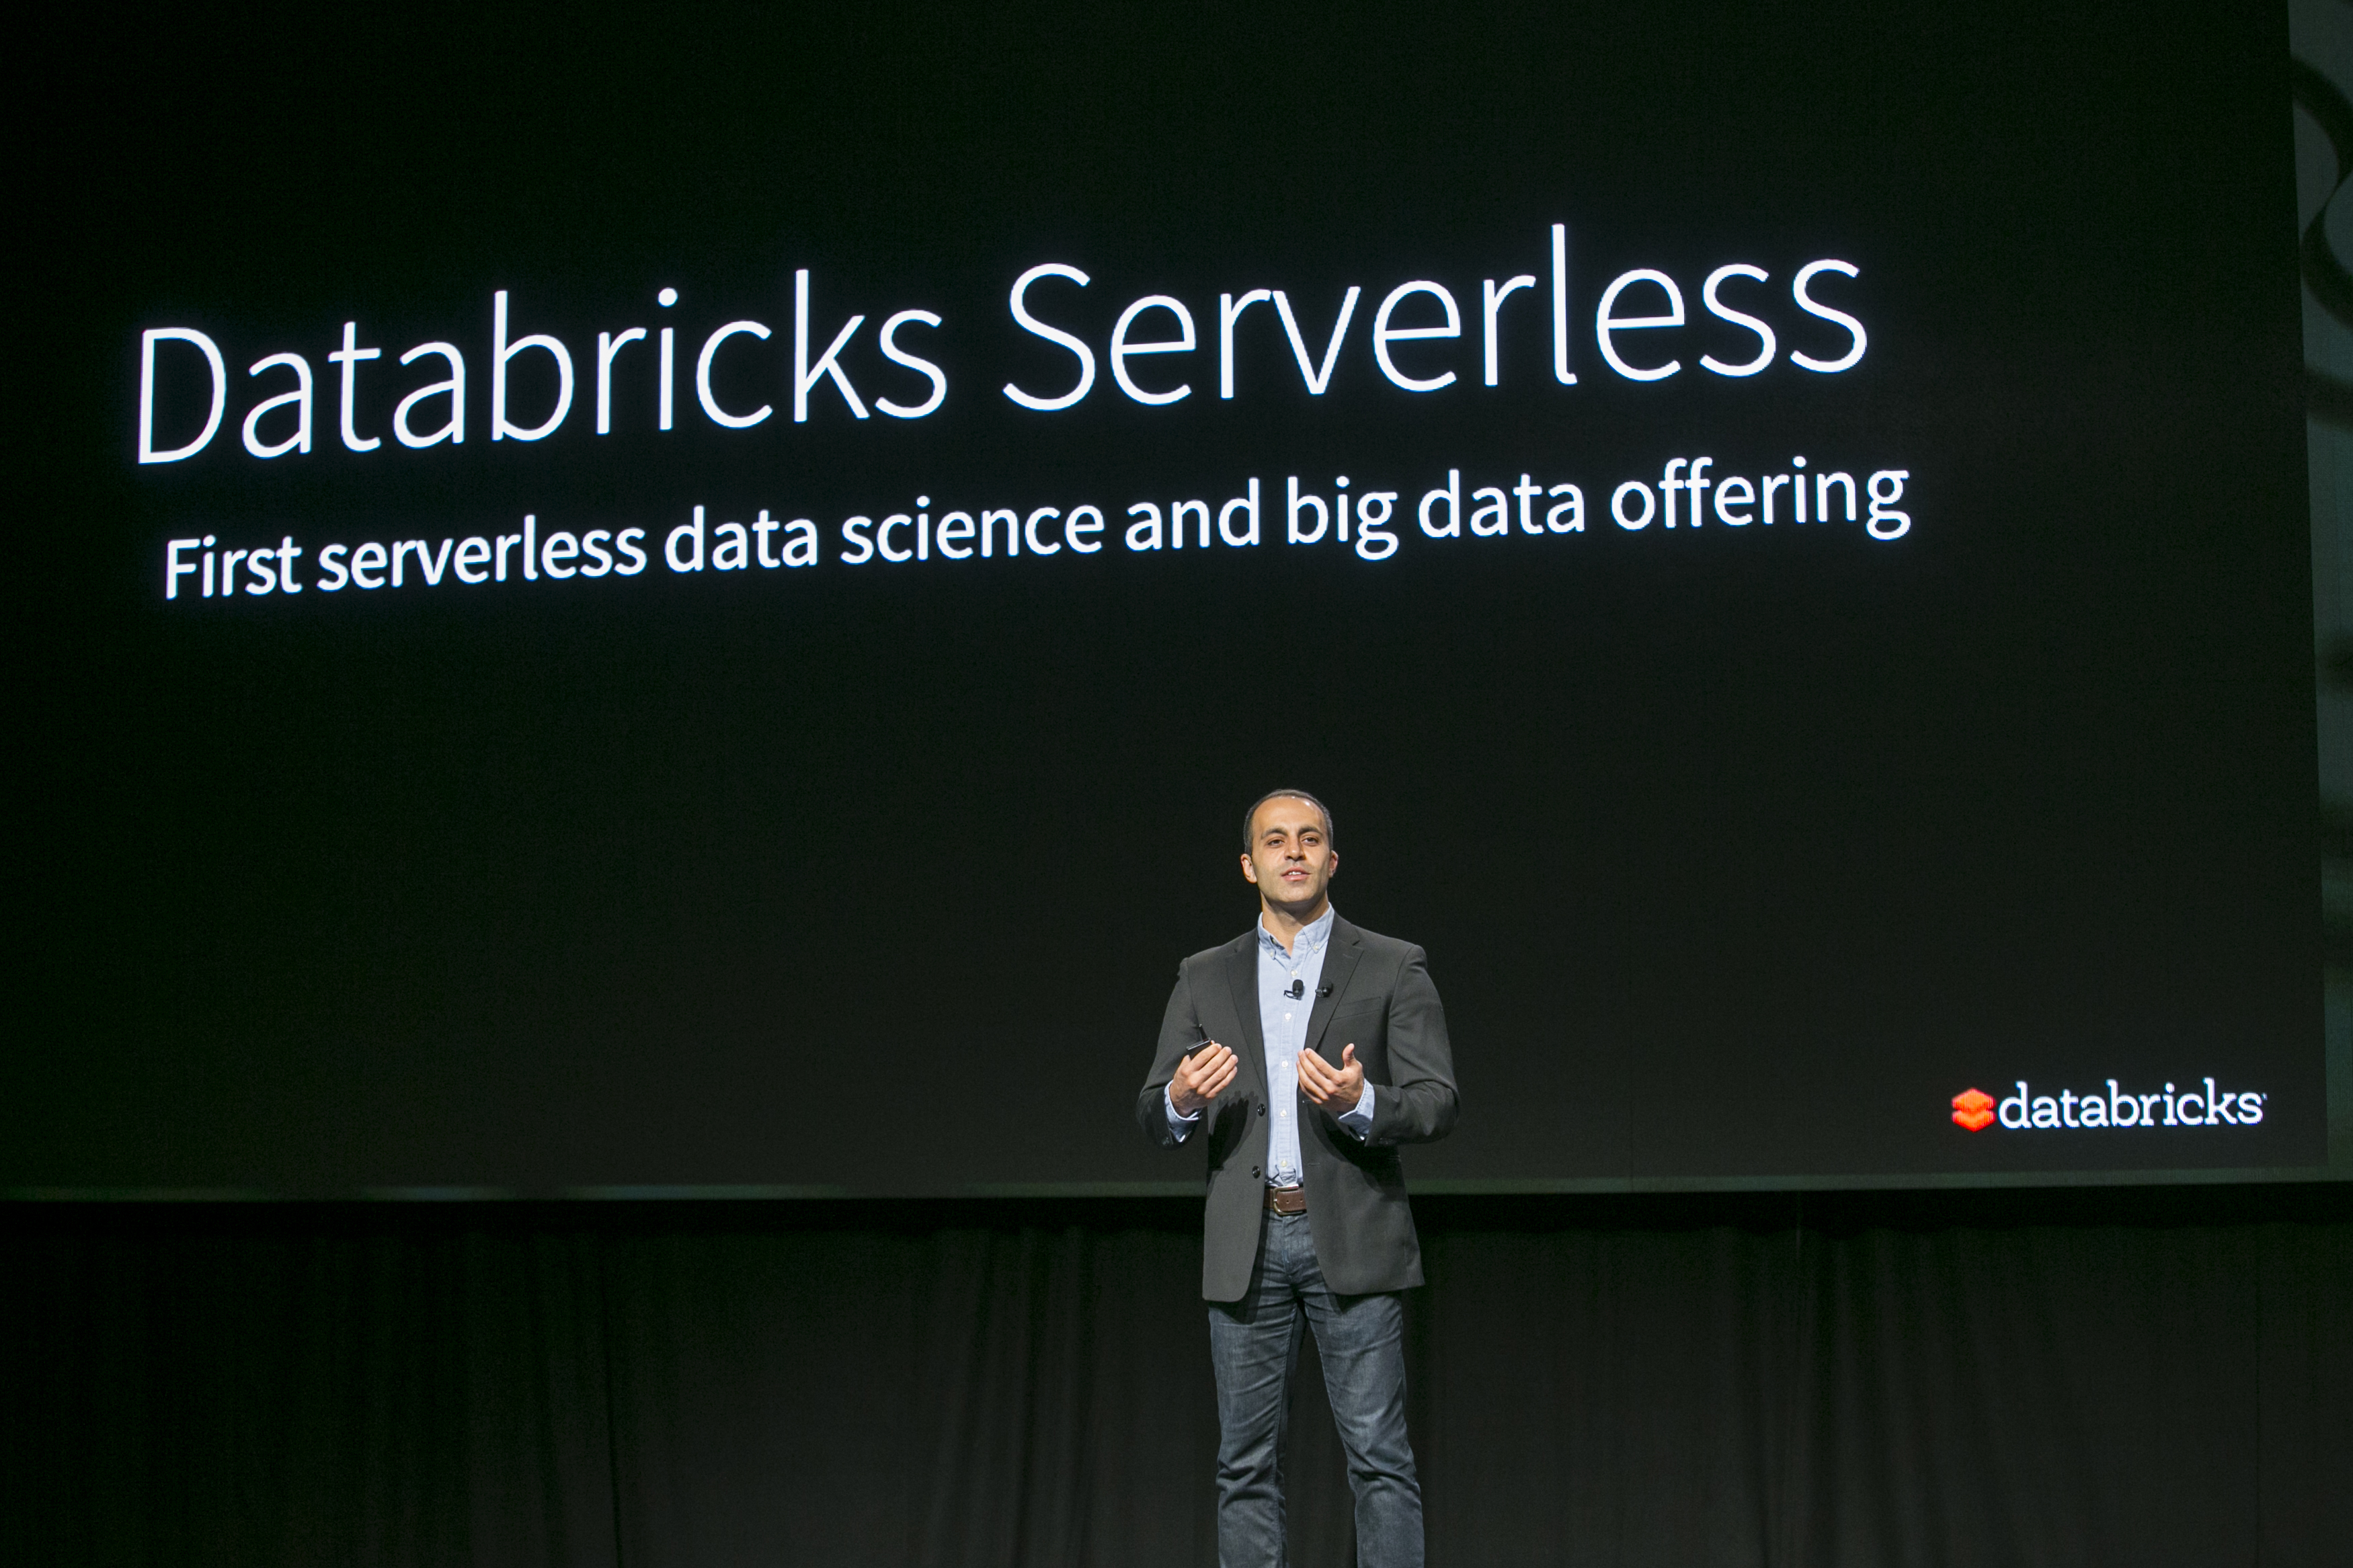 Databricks co-founder and CEO Ali Ghosdi